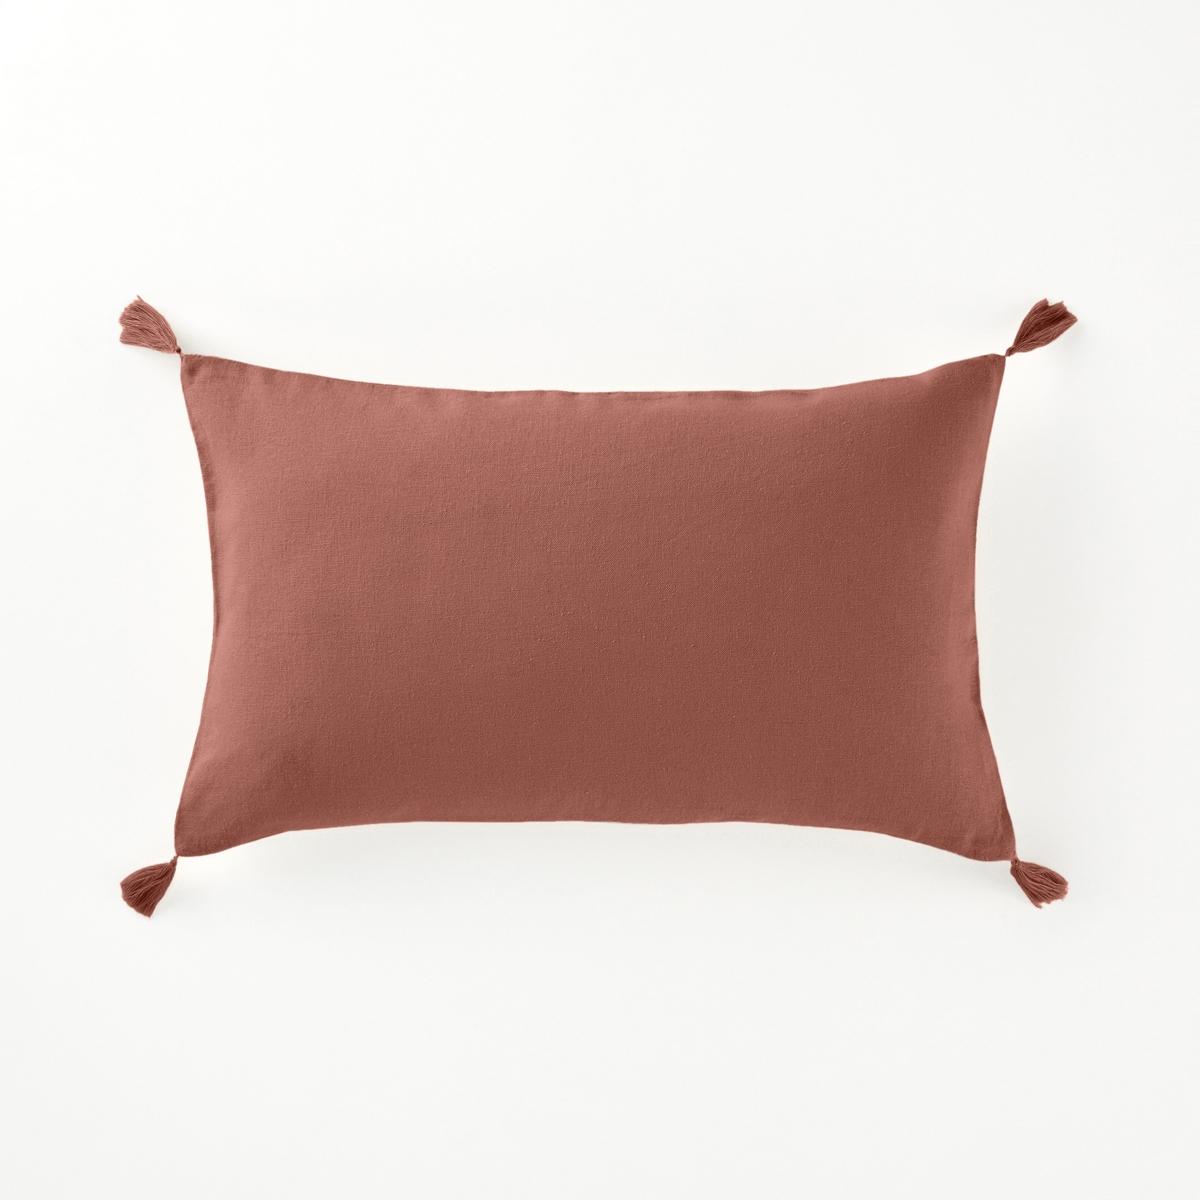 наволочки на подушку и наволочка на подушку валик из хлопка richmond Наволочка LaRedoute На подушку-валик из льна и вискозы ODORIE 50 x 30 см каштановый